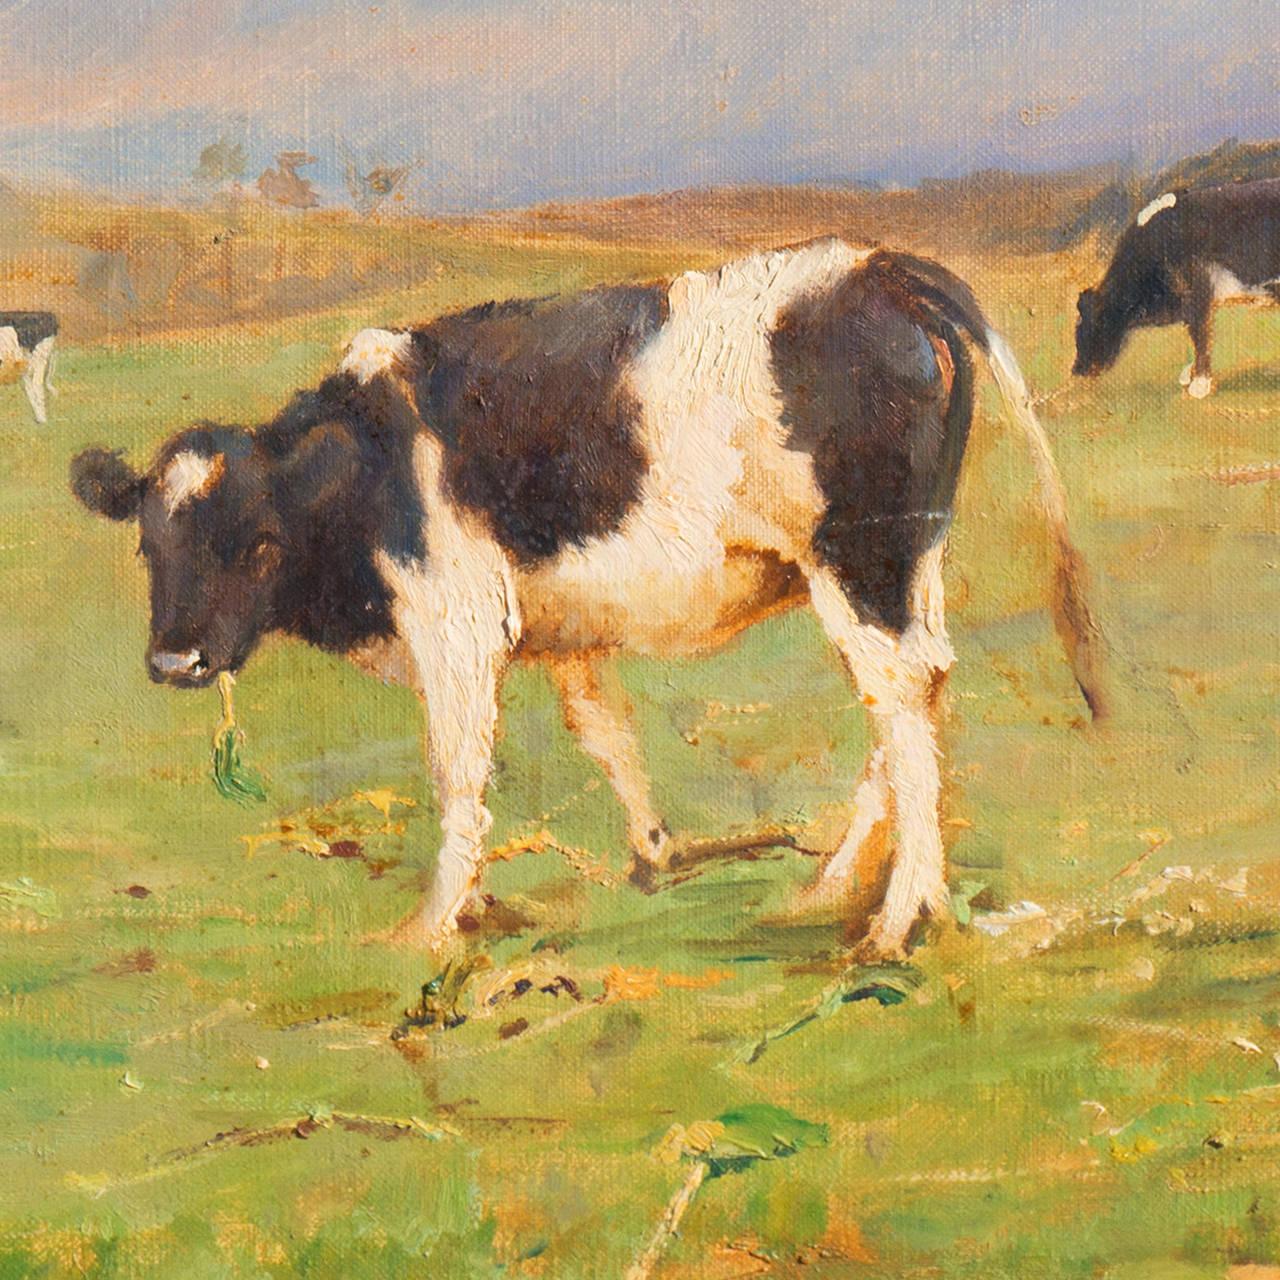 'Cattle at Pasture', Danish Impressionist Landscape oil, Paris, France  - Black Animal Painting by Gunnar Bundgaard